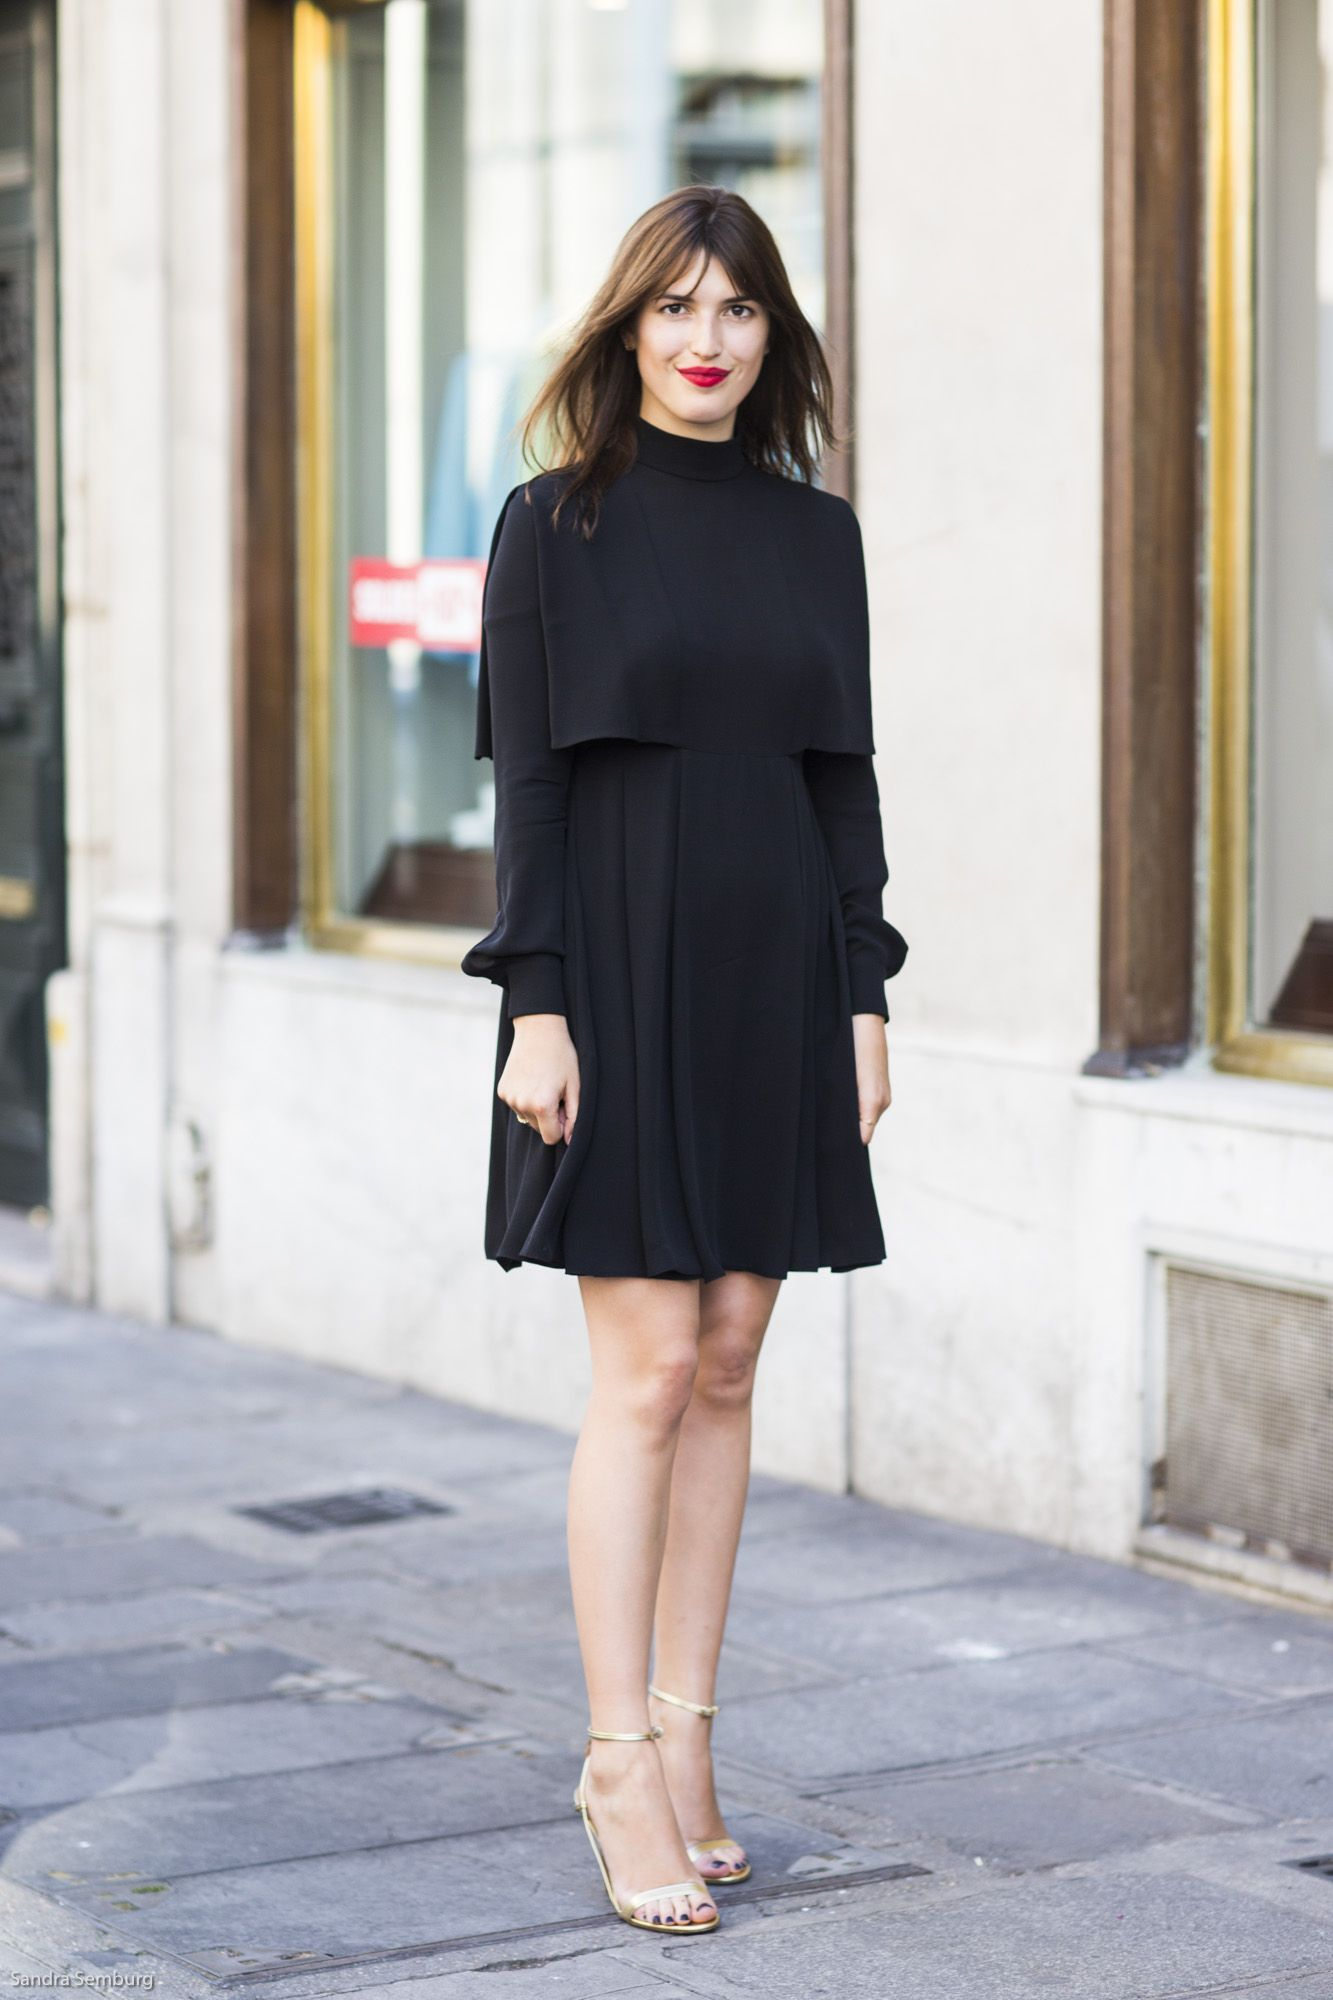 Black dress with red lipstick - Jeane Damas In Classy Little Black Dress Red Lipstick Gold Sandals Street